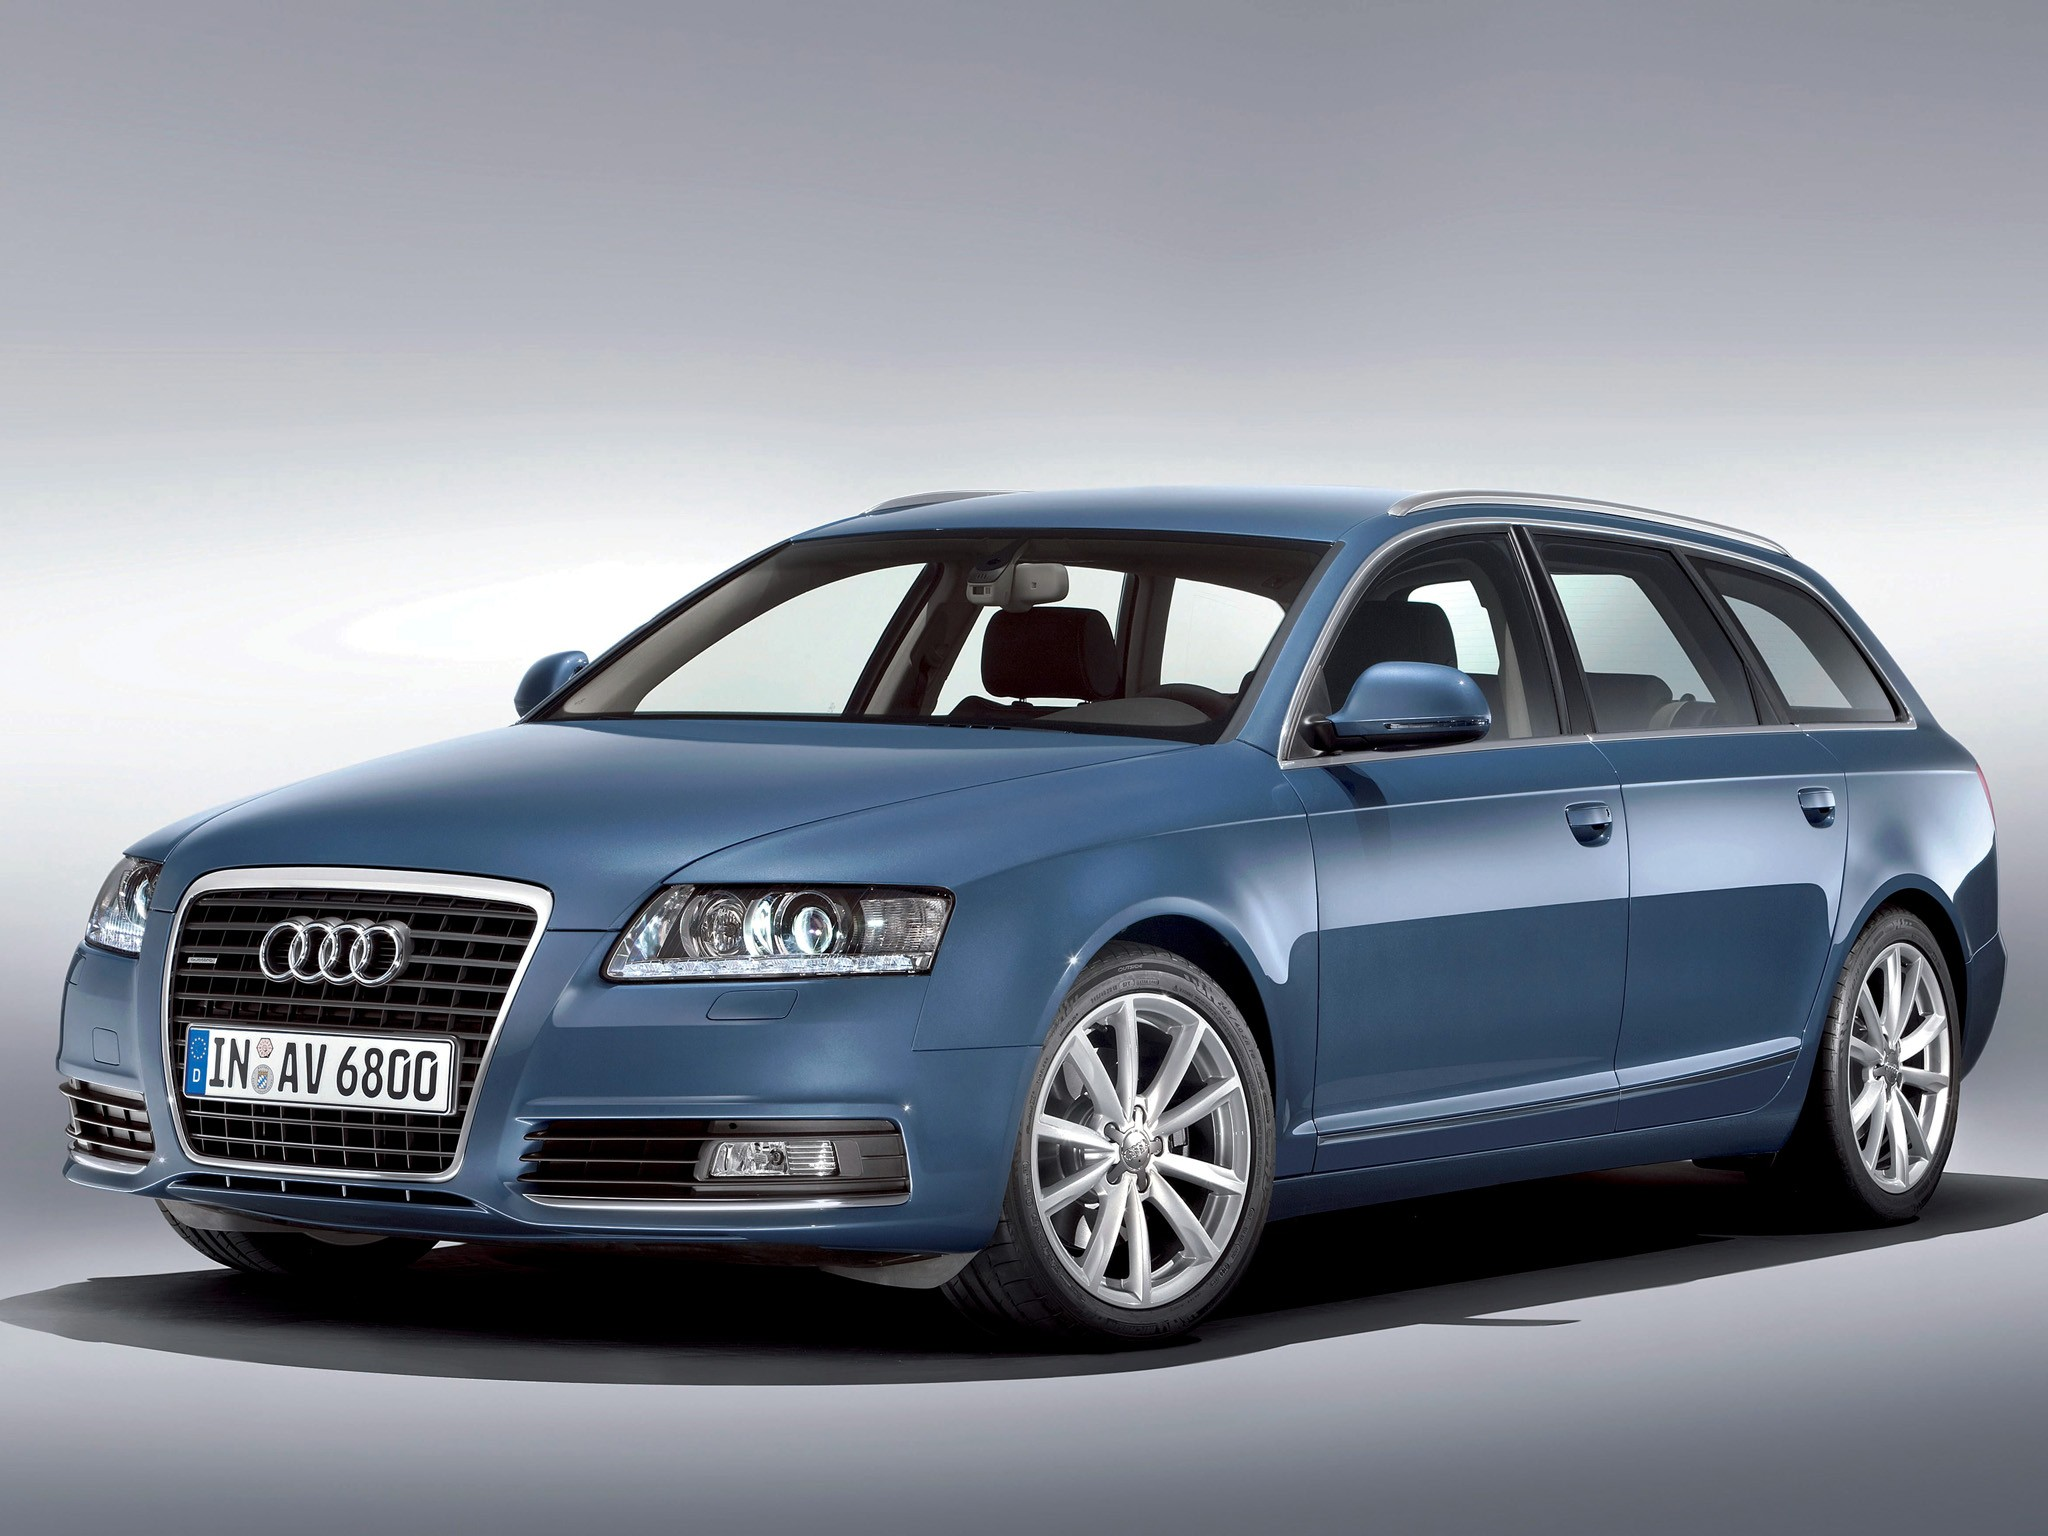 Kekurangan Audi A6 2011 Tangguh